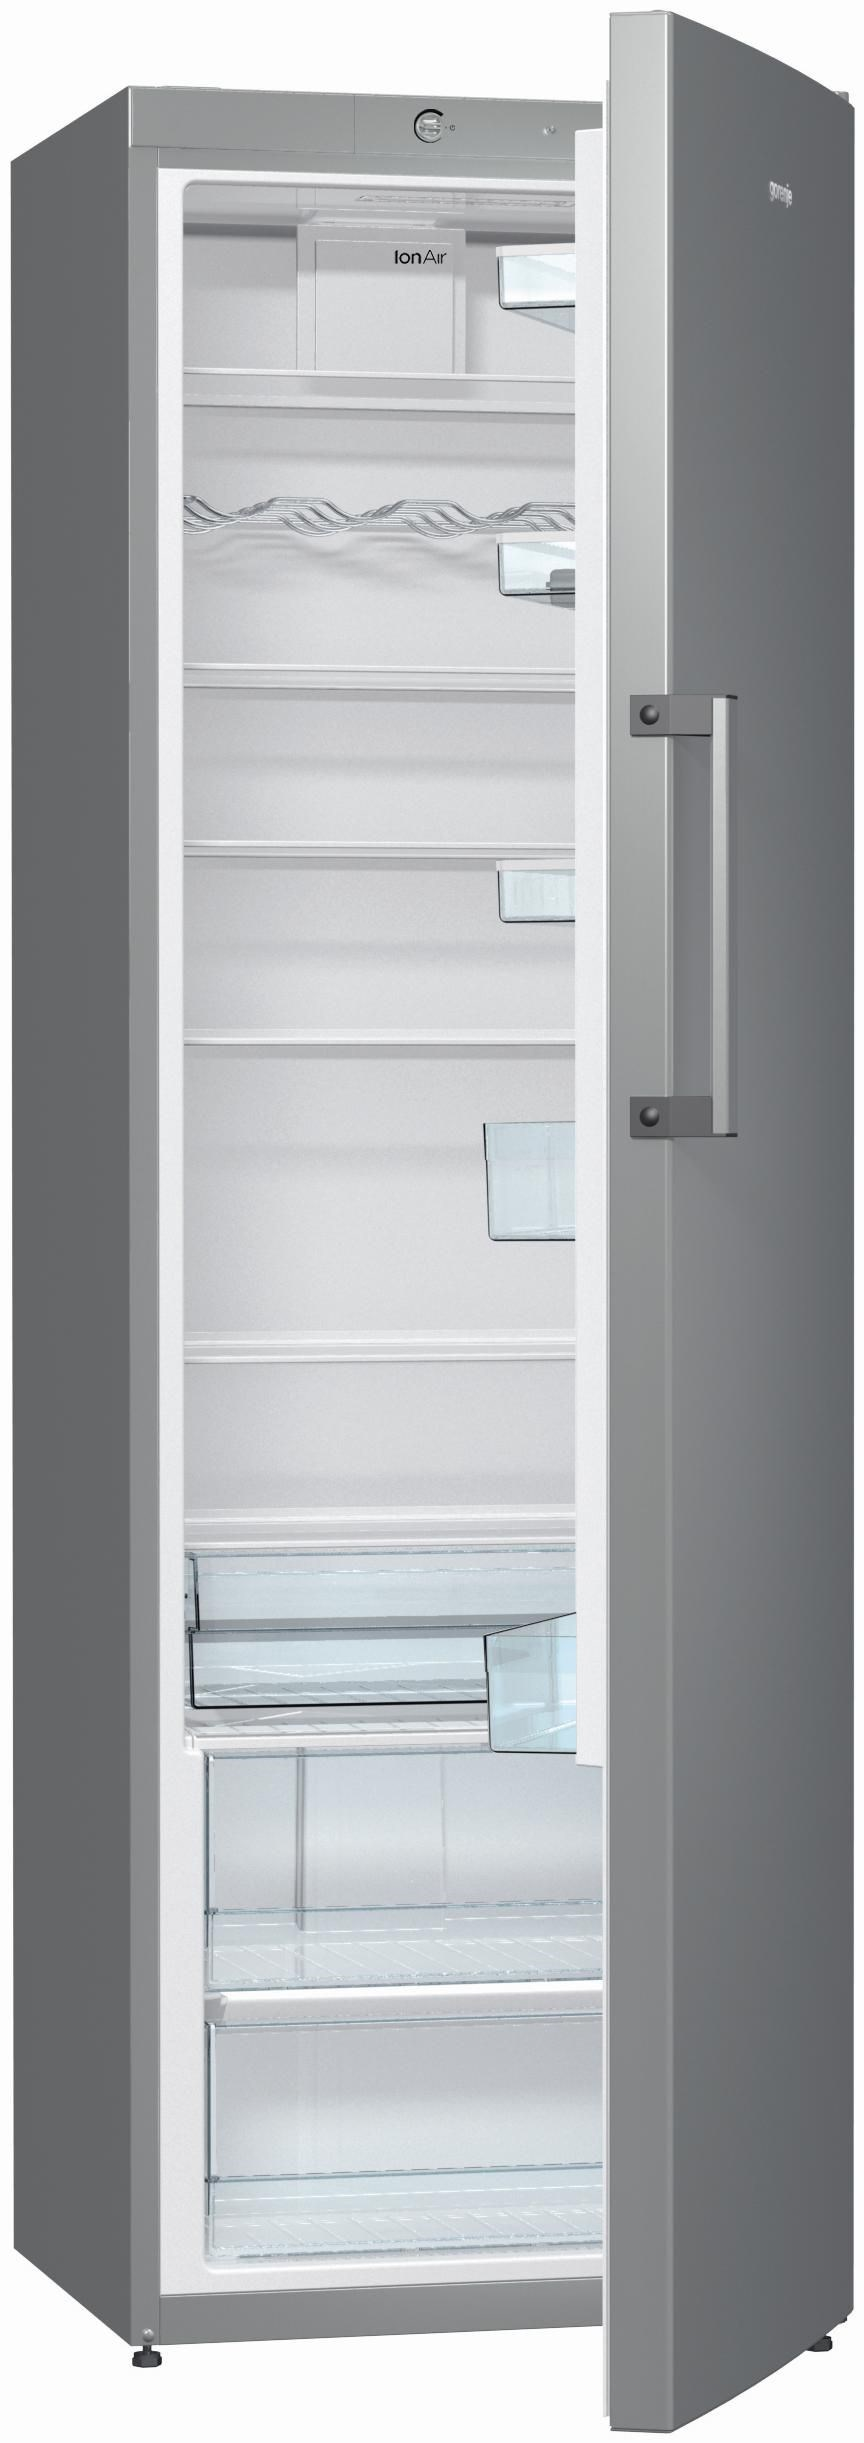 gorenje r6192fx inox vollraum k hlschrank h 185 cm b 60. Black Bedroom Furniture Sets. Home Design Ideas